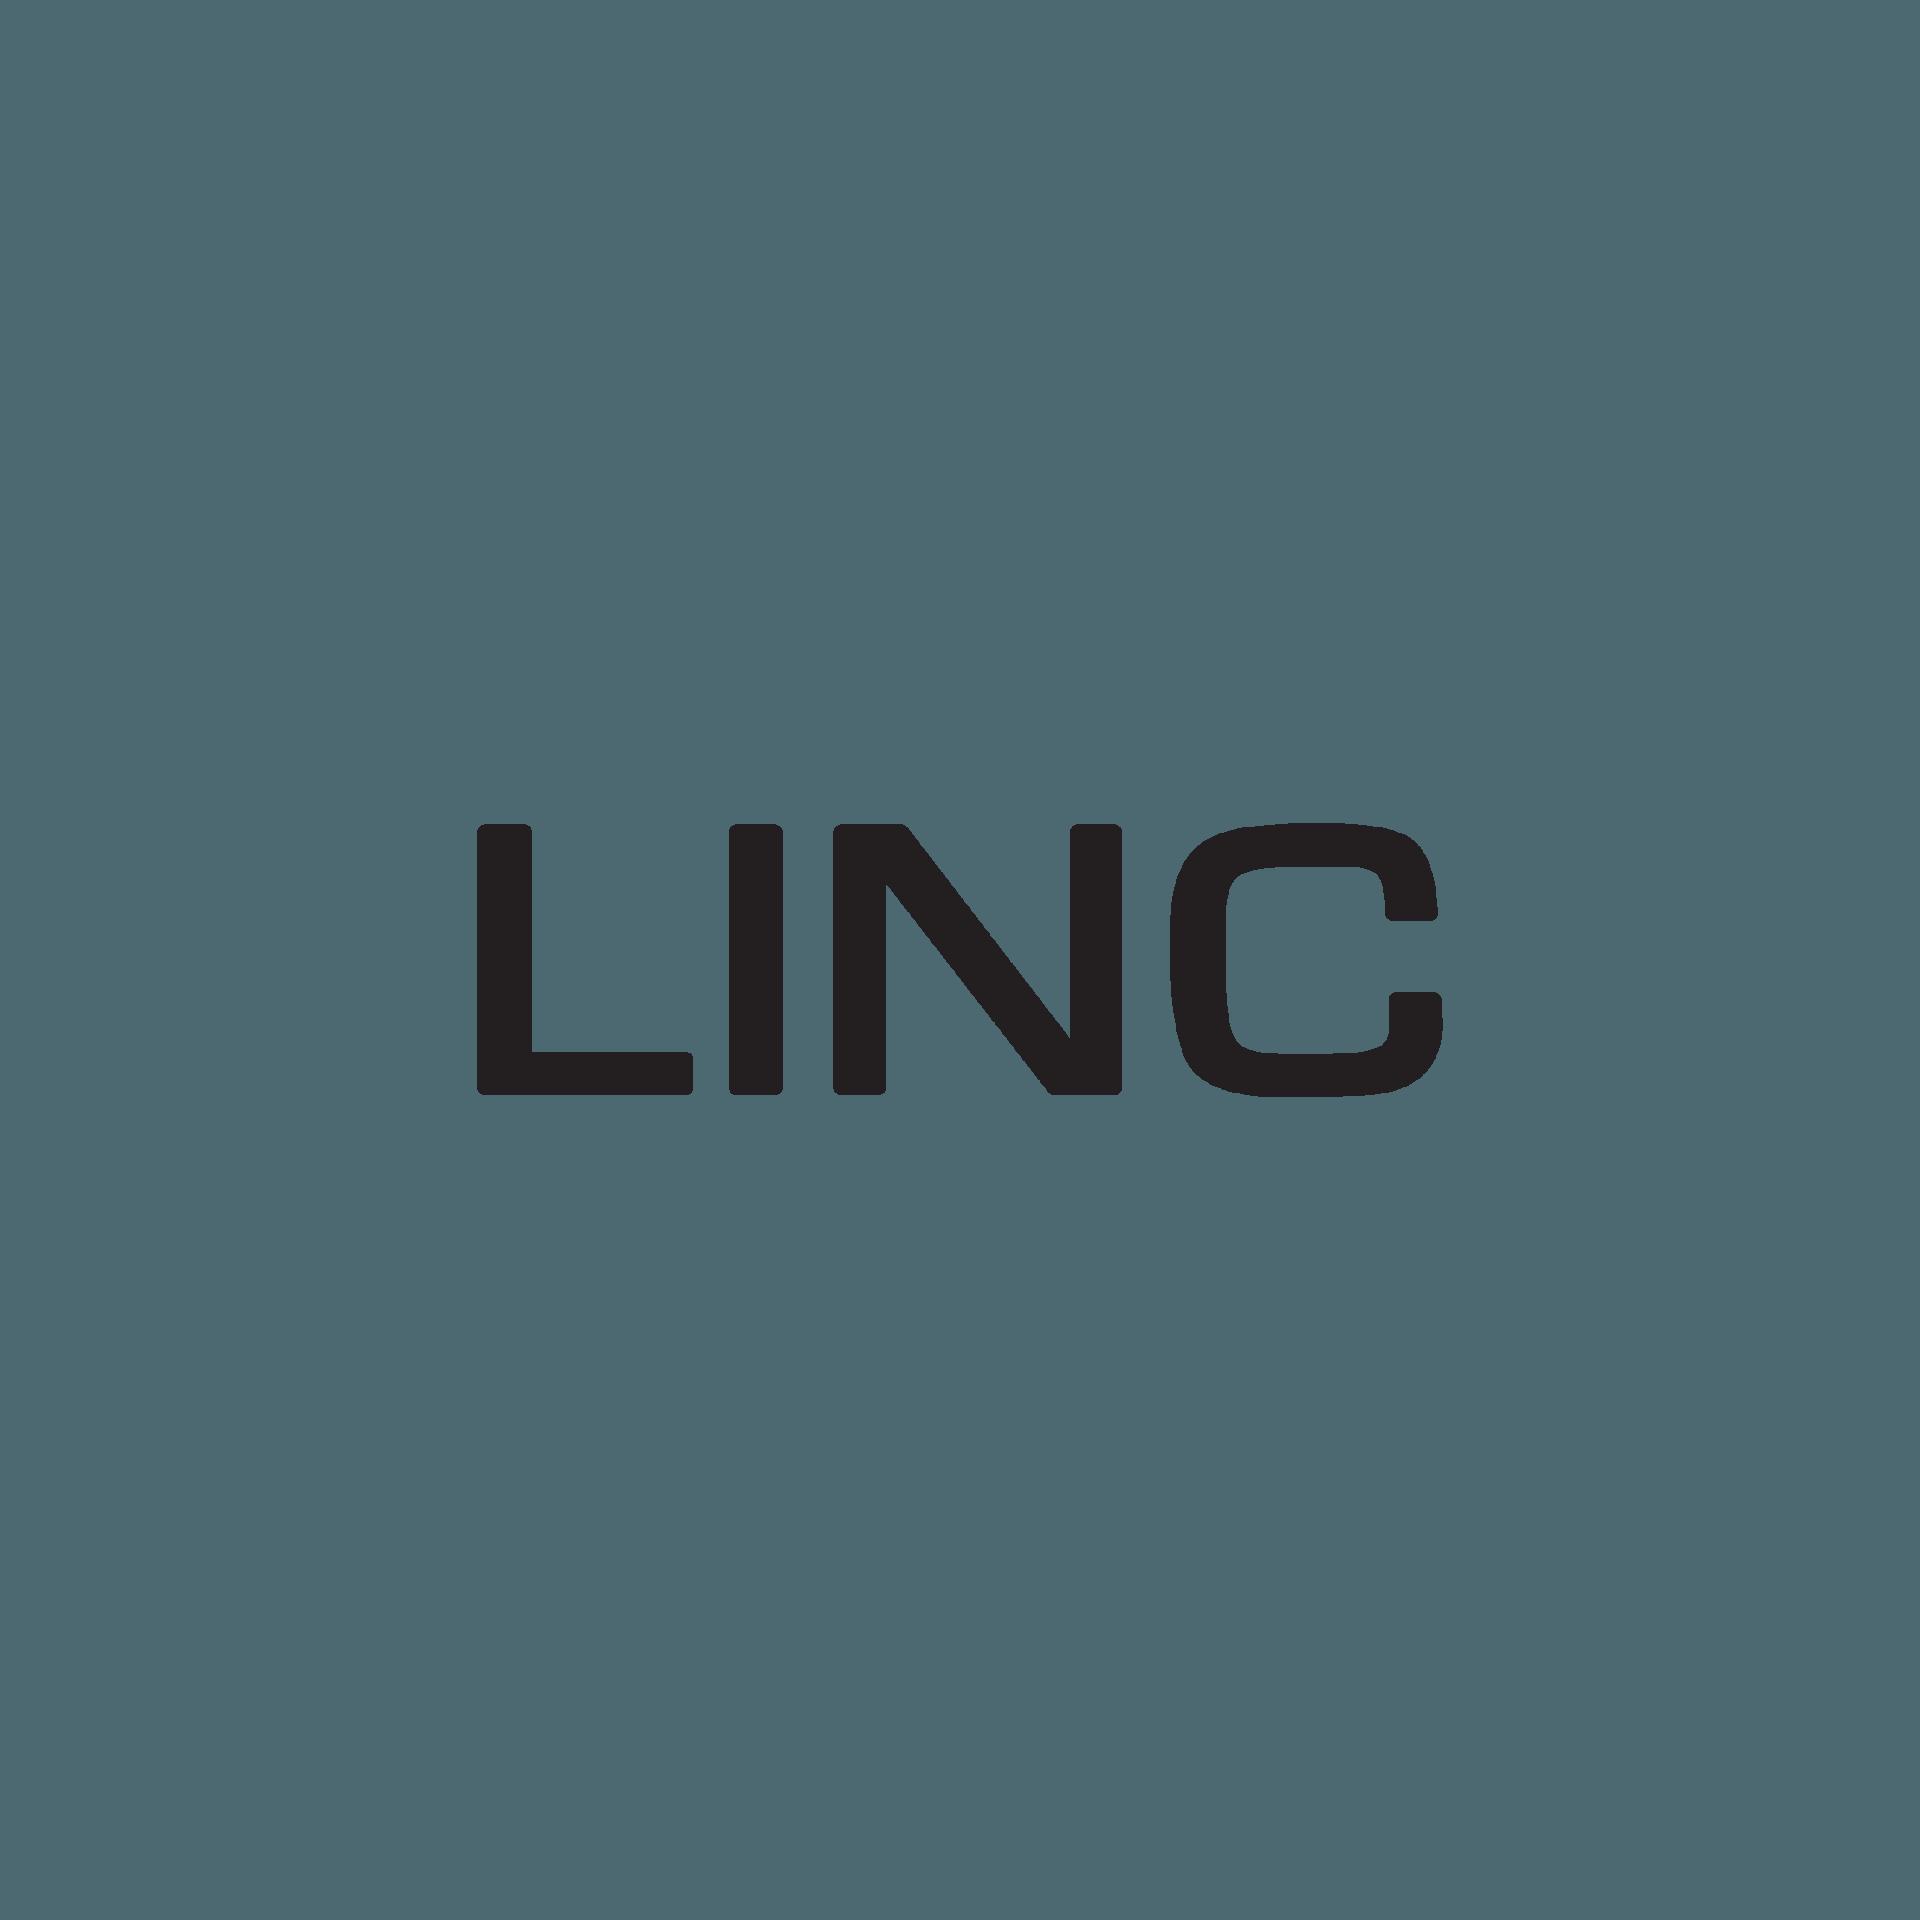 Logo for Linc Church, Word Linc in black